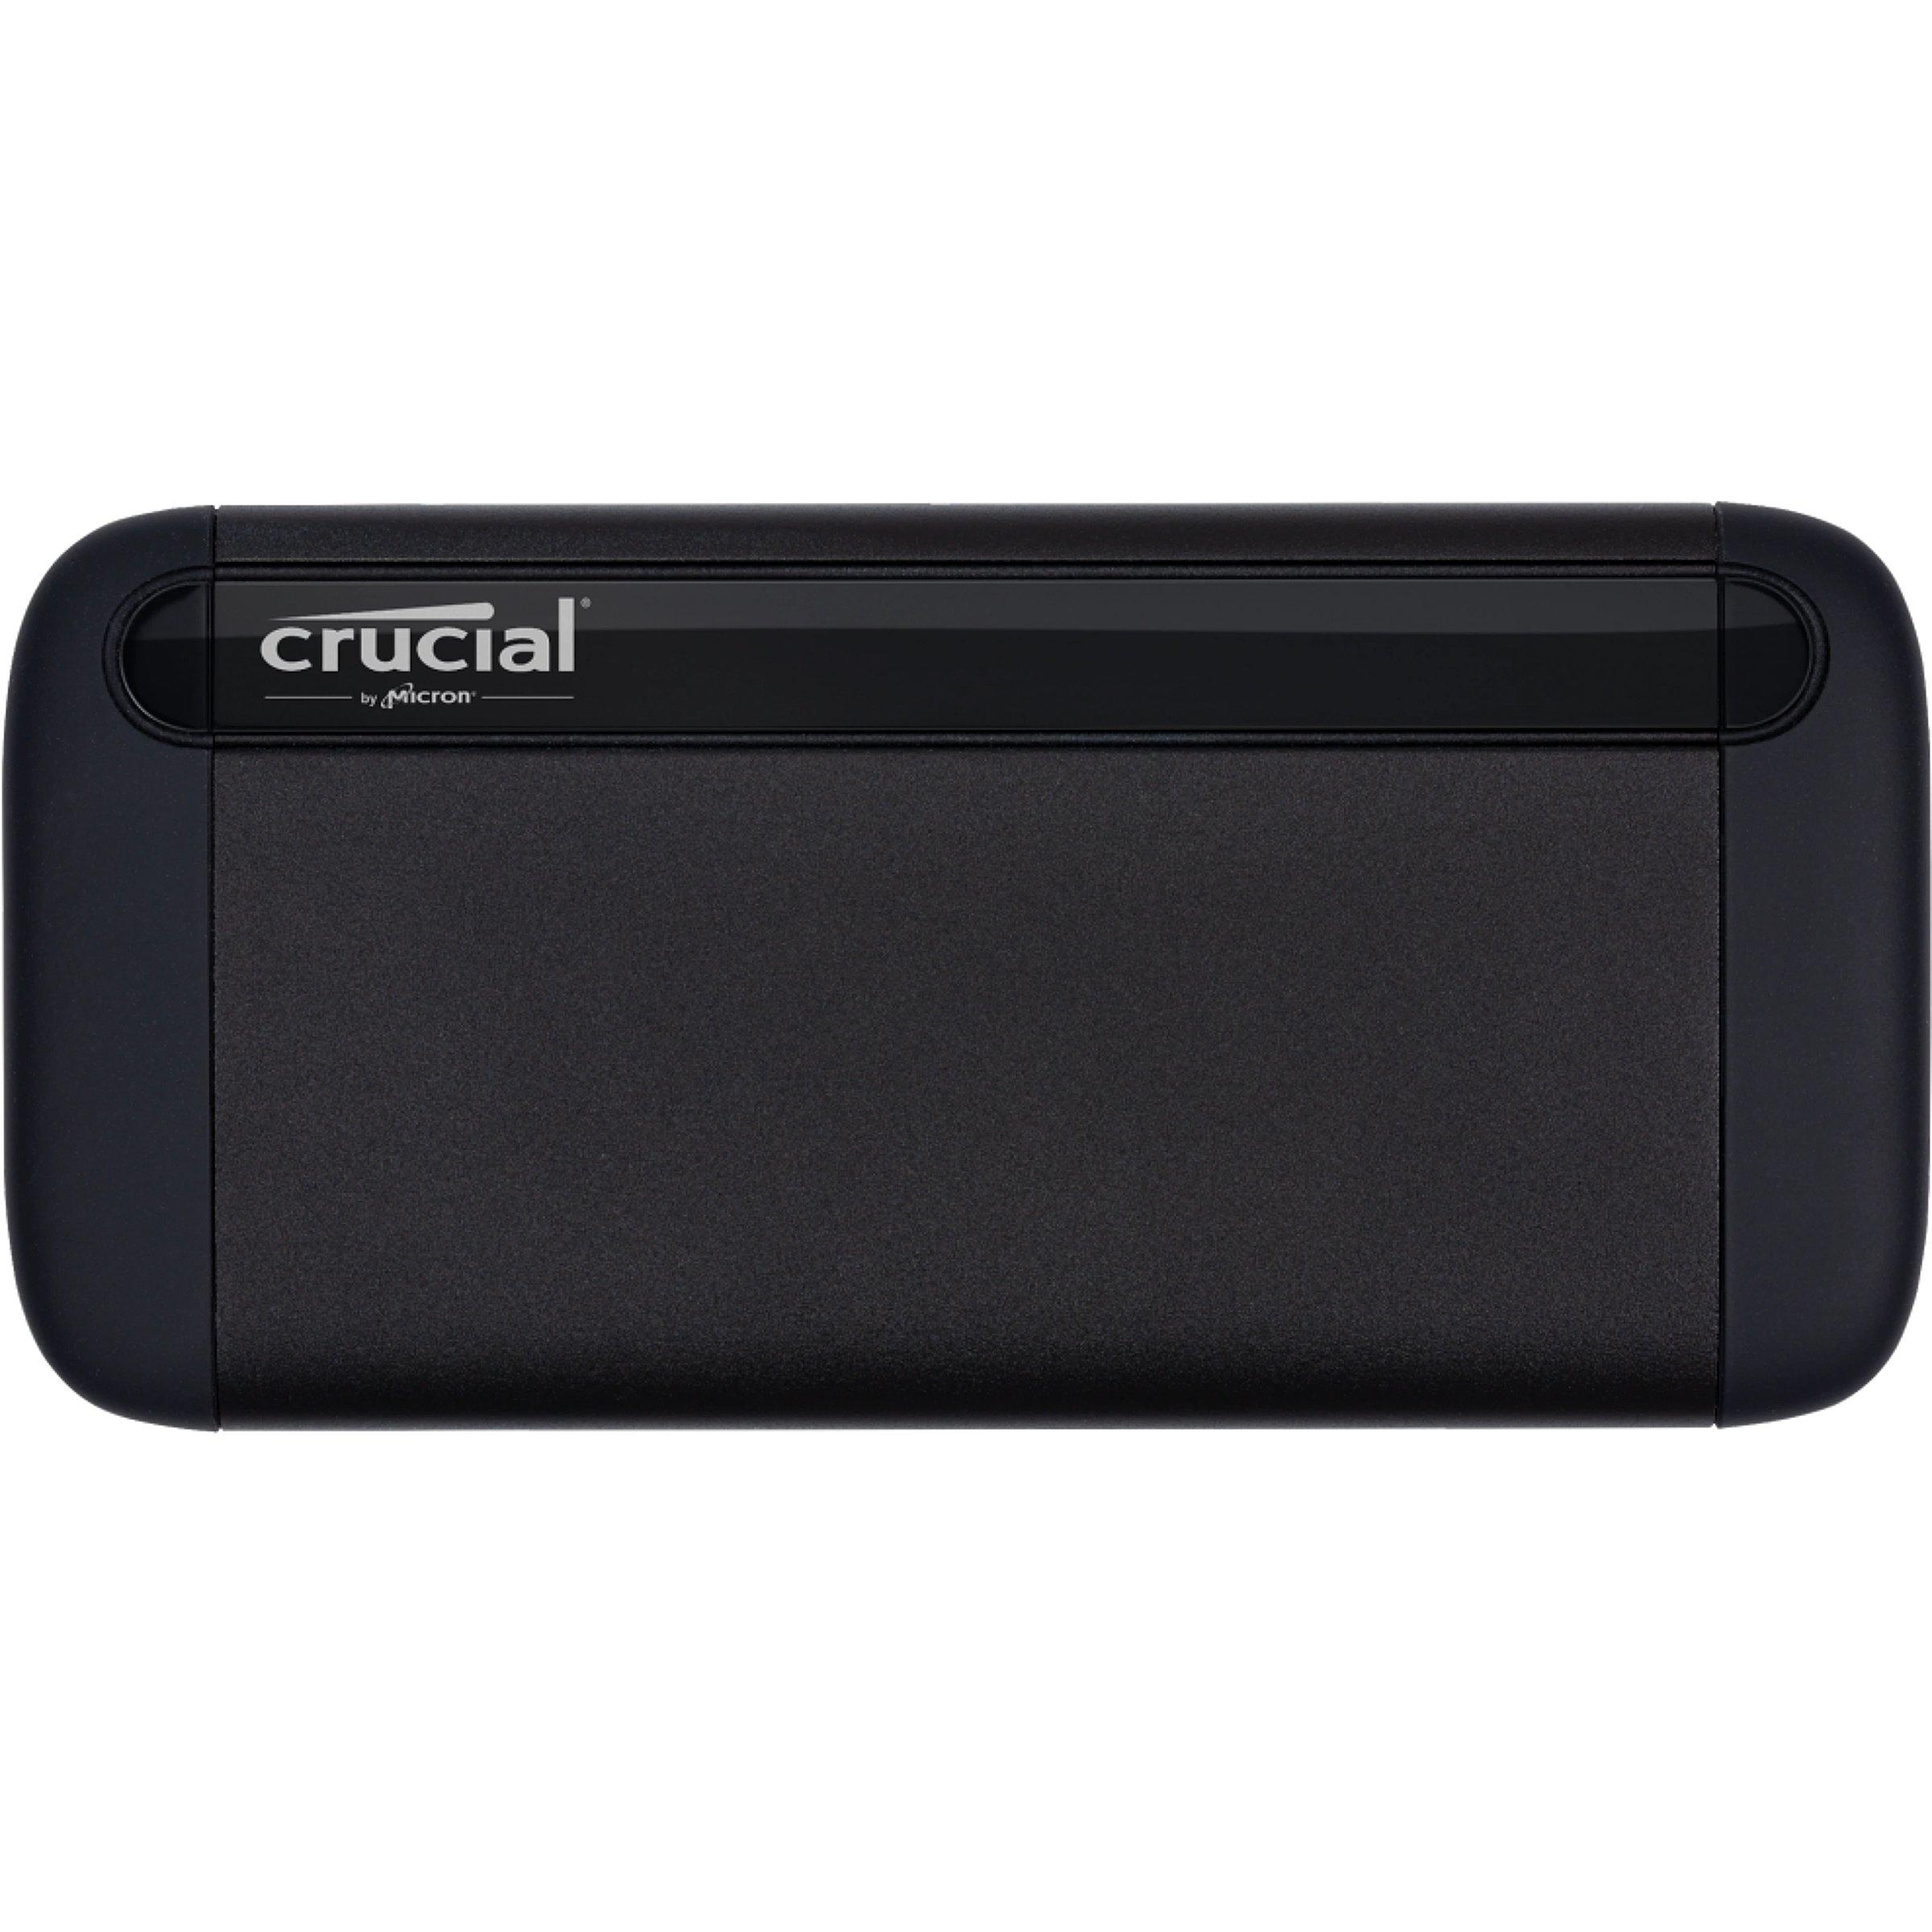 Crucial X8 Portable SSD 1TB, 2.5